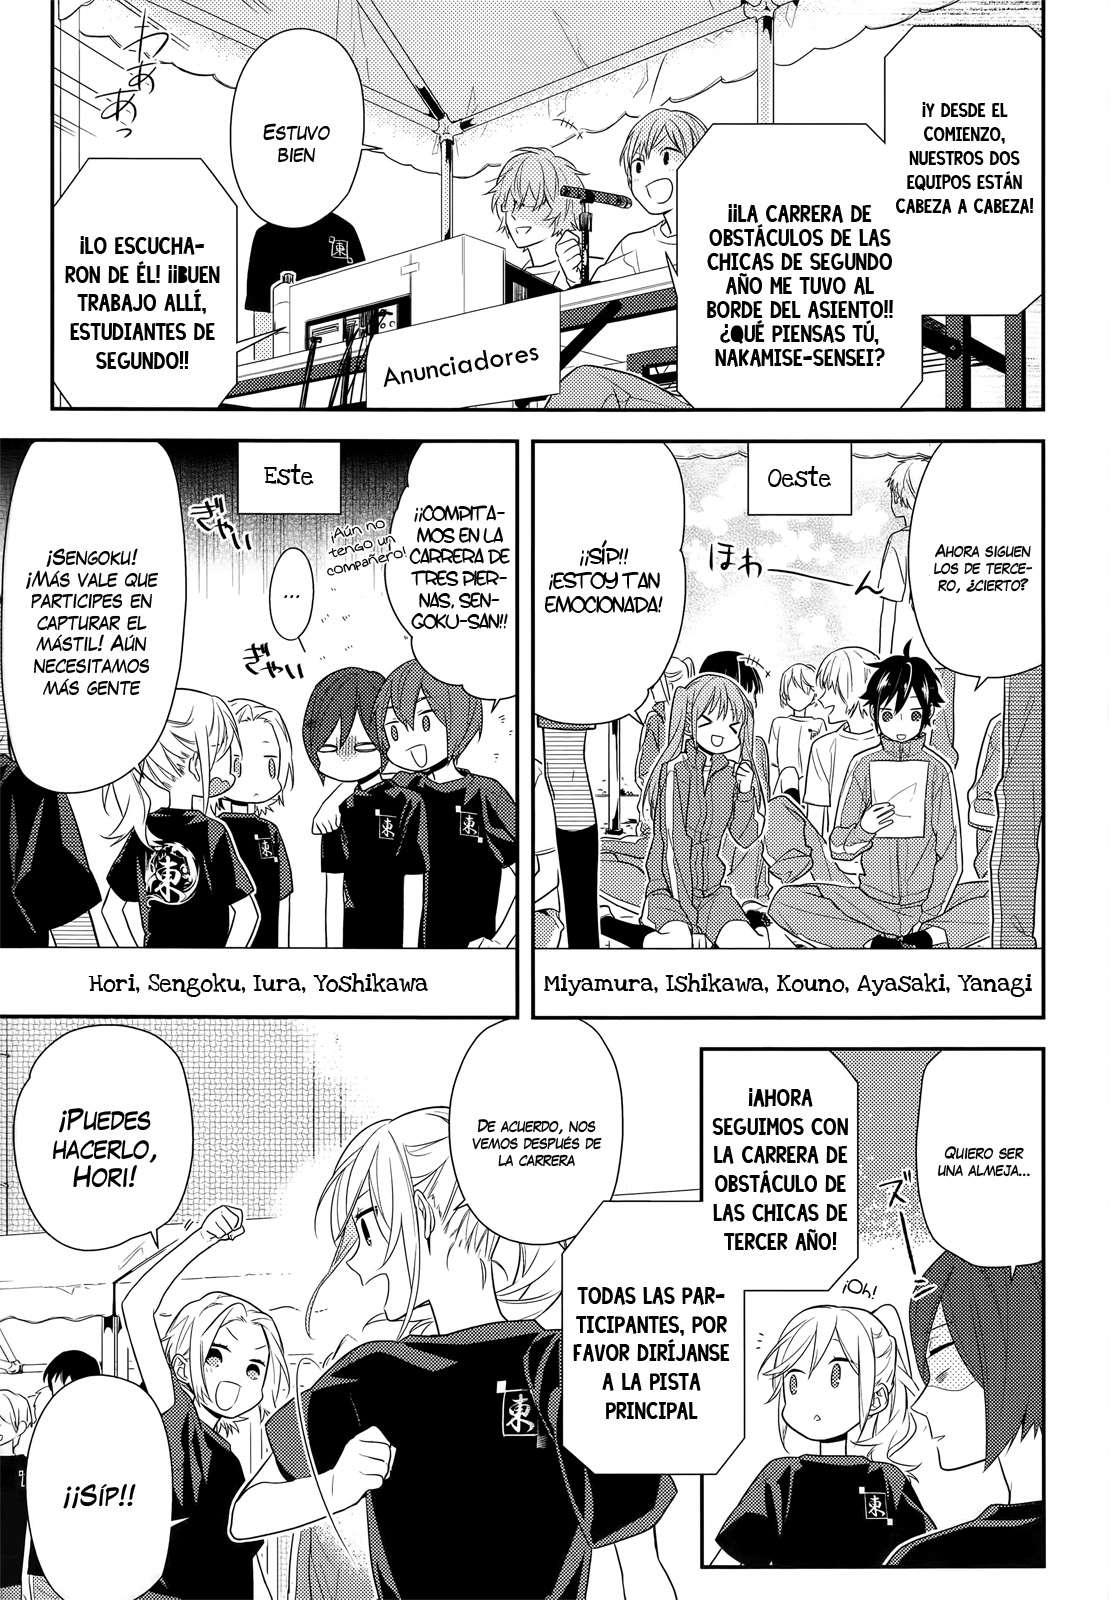 http://c5.ninemanga.com/es_manga/19/1043/378211/f8aac844cd8c2808caee118b003bcc17.jpg Page 7